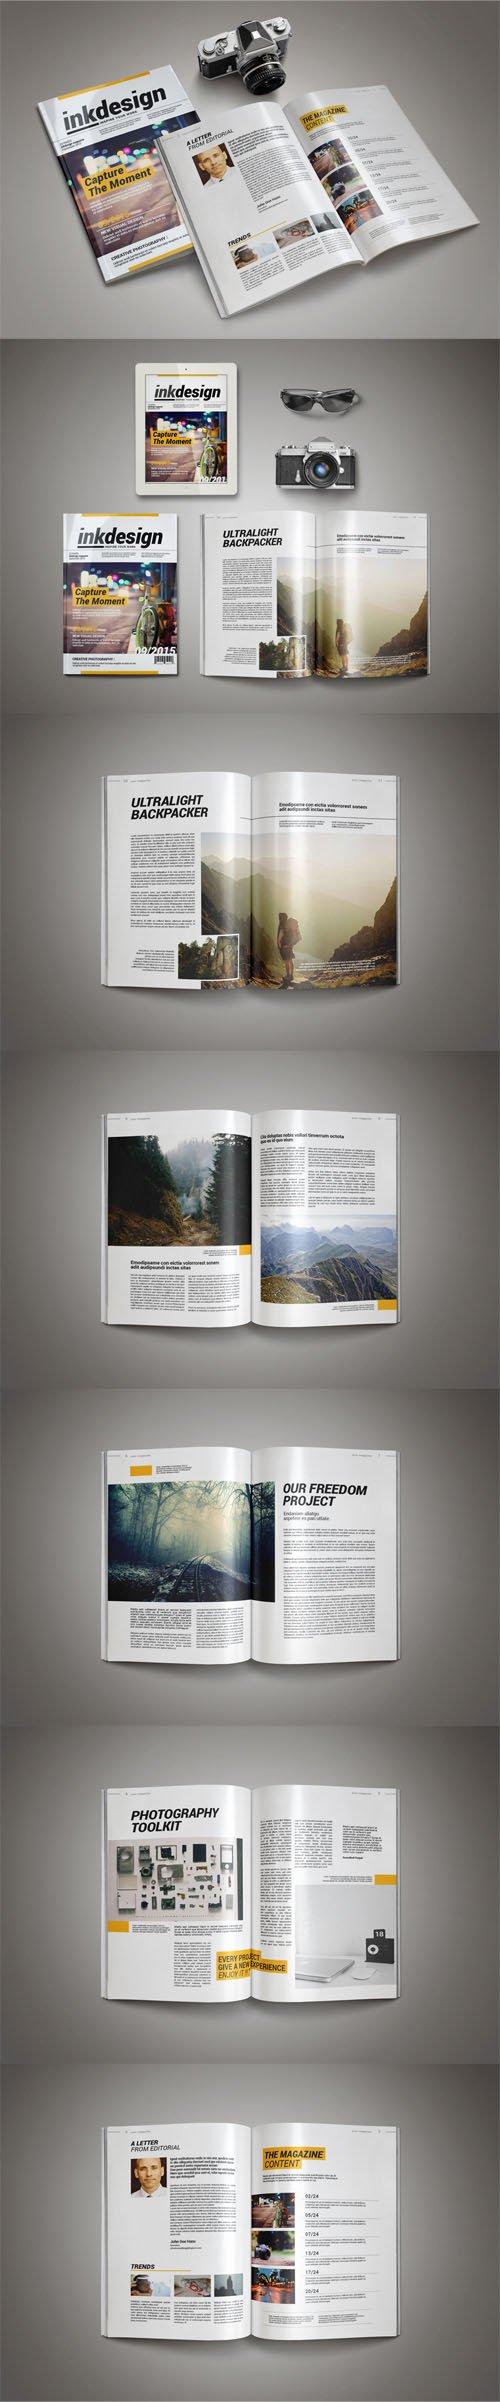 InkDesign Magazine INDD Template for InDesign